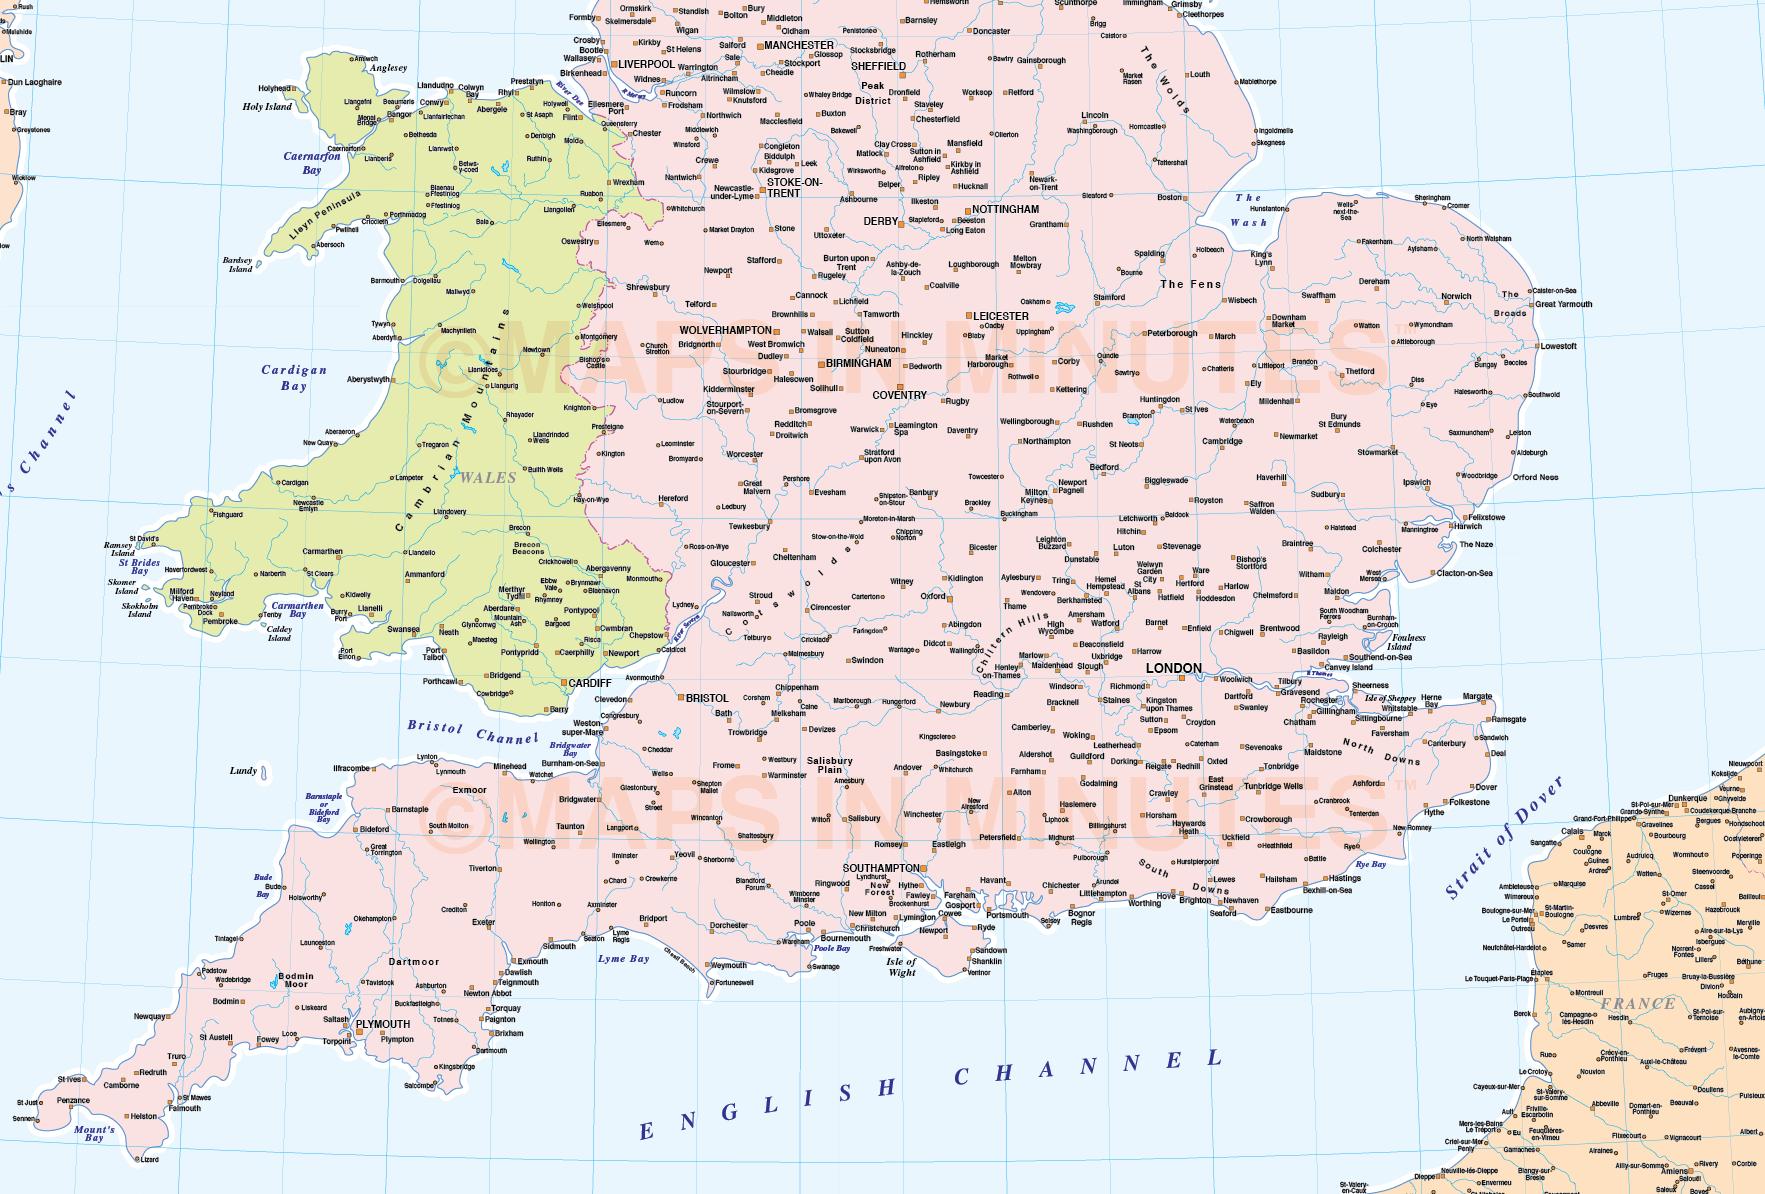 pdf map of england london map